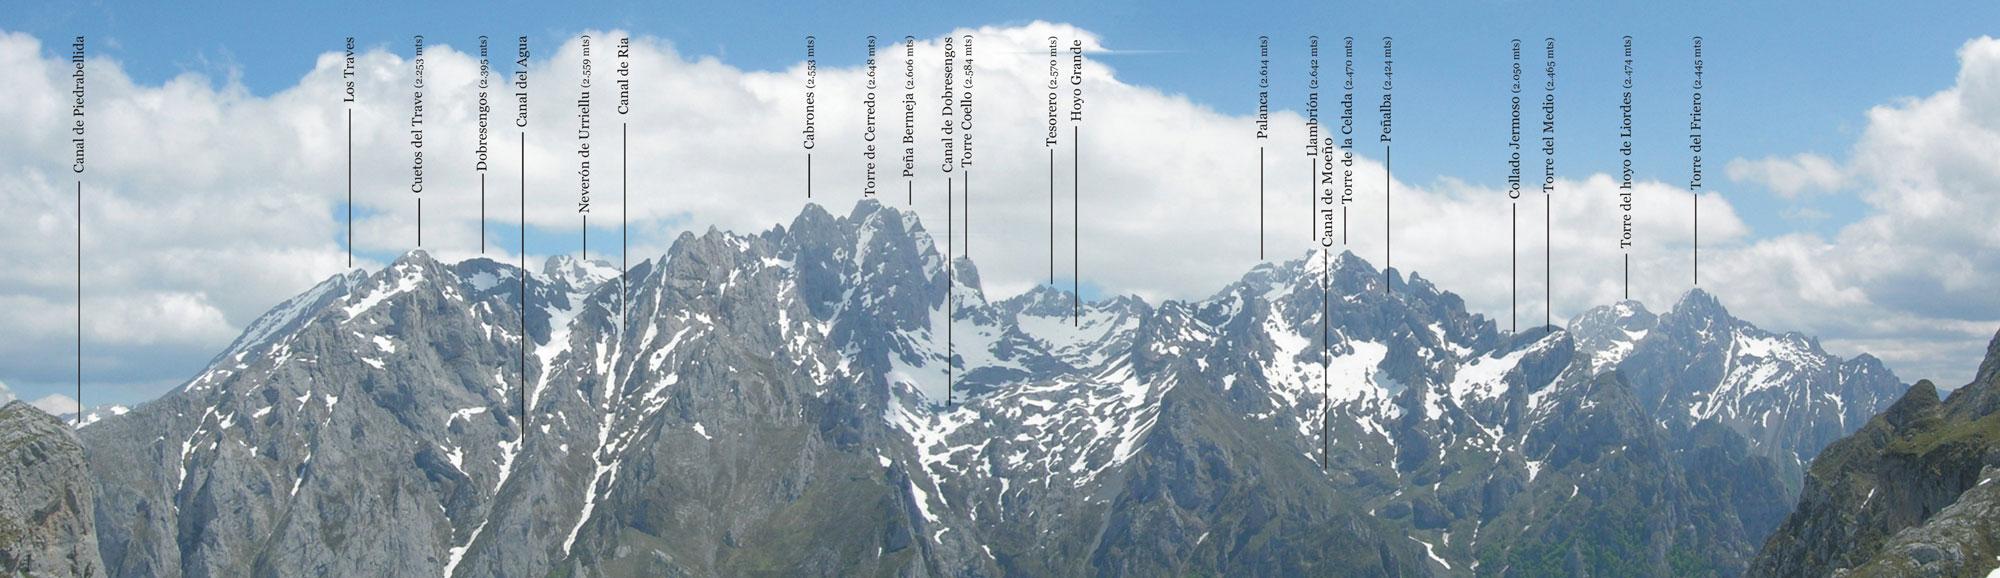 Panoru00e1mica de los Urrieles (Macizo Central de Picos de Europa) desde ...